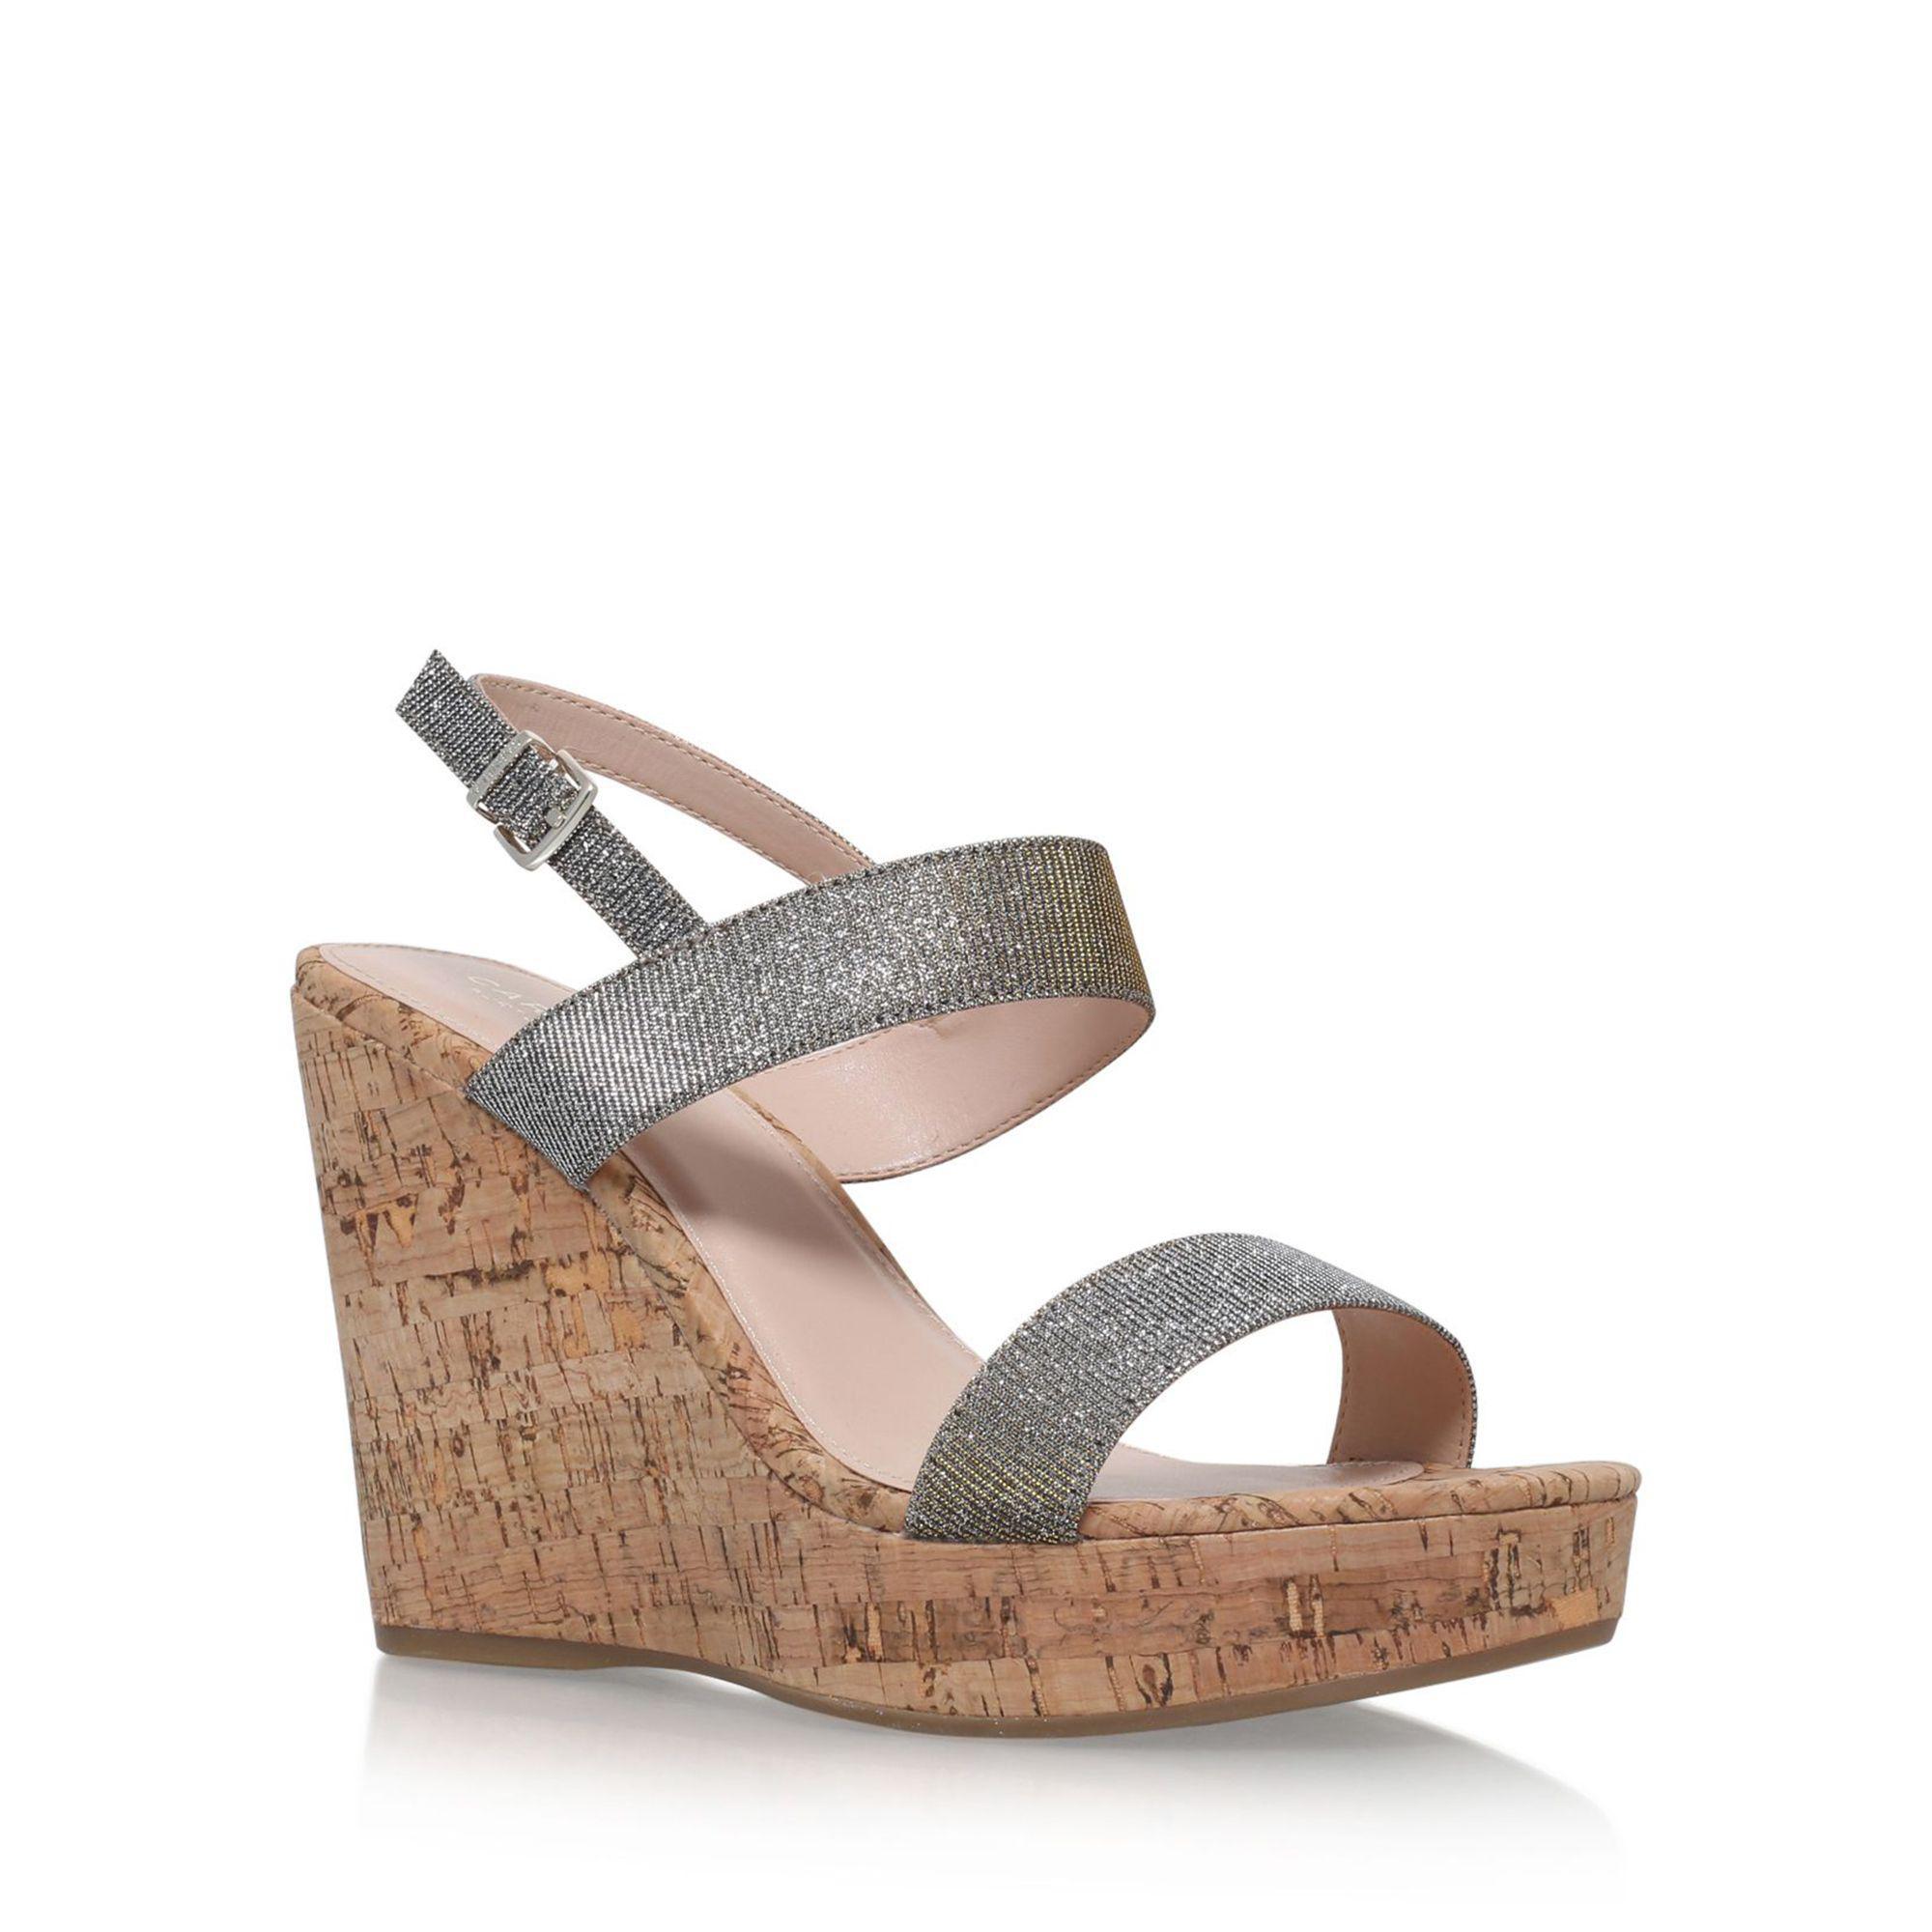 60b4a7ecf3 Carvela Kurt Geiger Metal 'kay' High Heel Wedge Sandals in Metallic ...